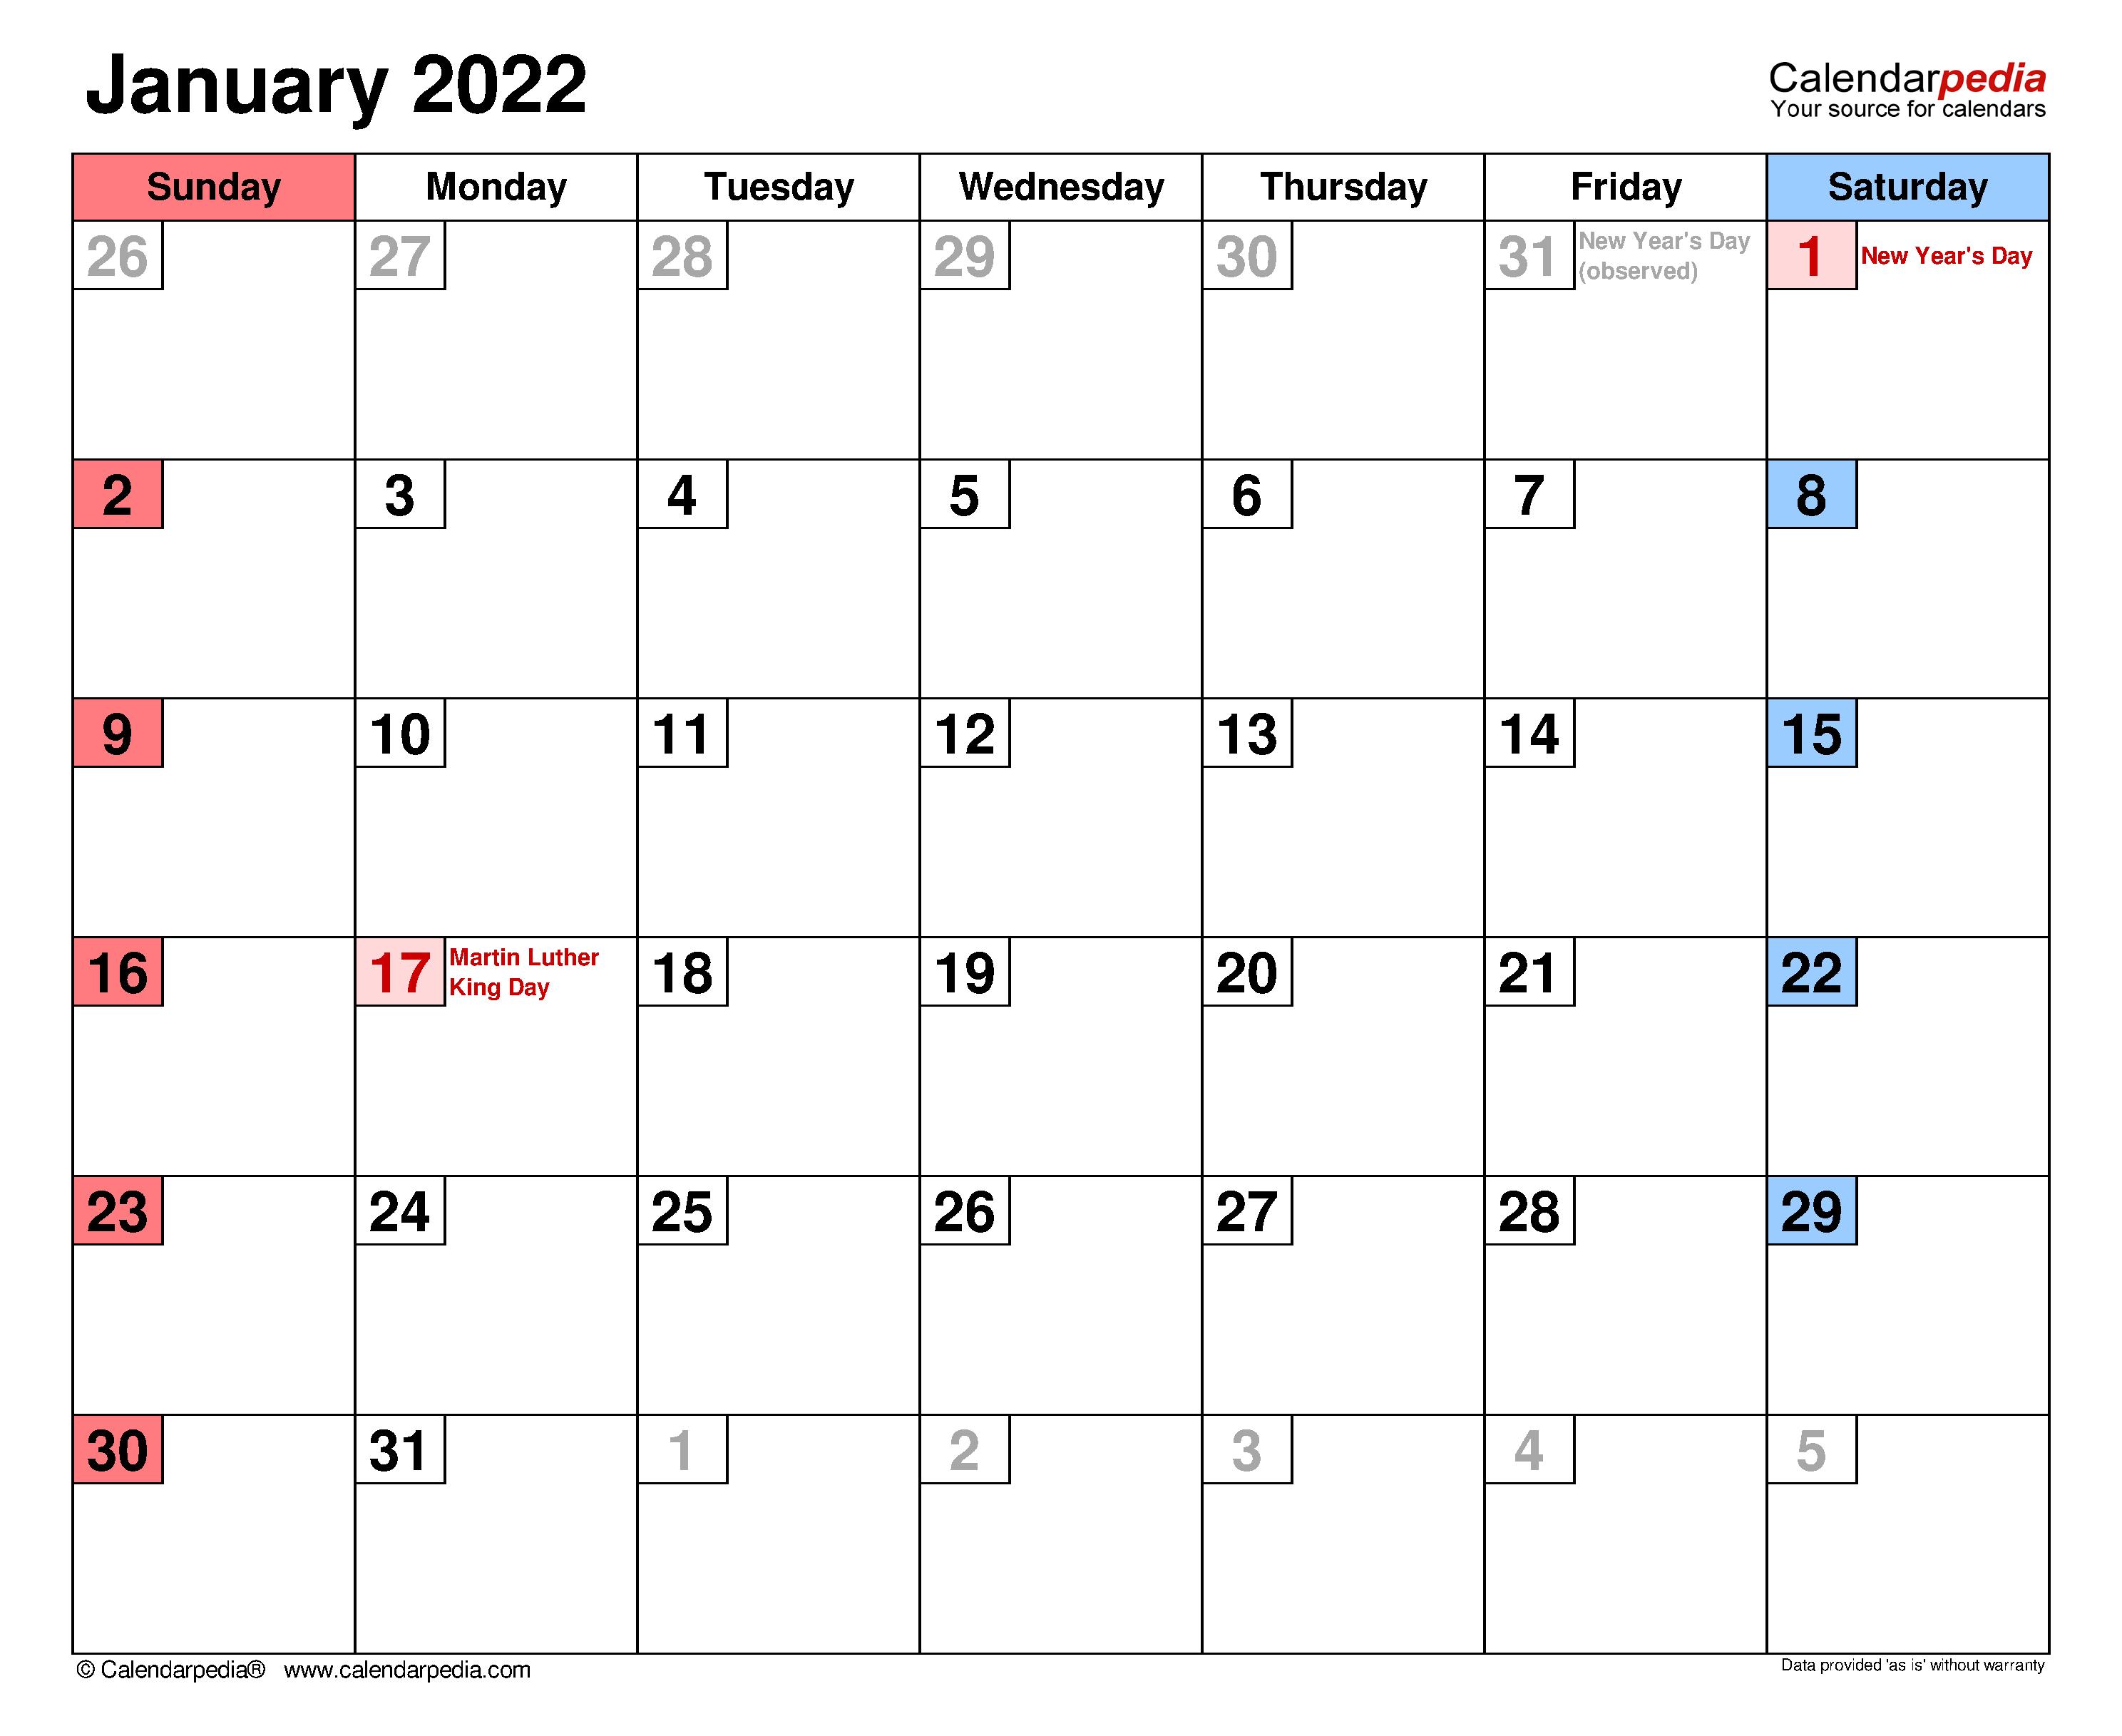 January 2022 Calendar | Templates For Word, Excel And Pdf Regarding Empty Calendar January 2022